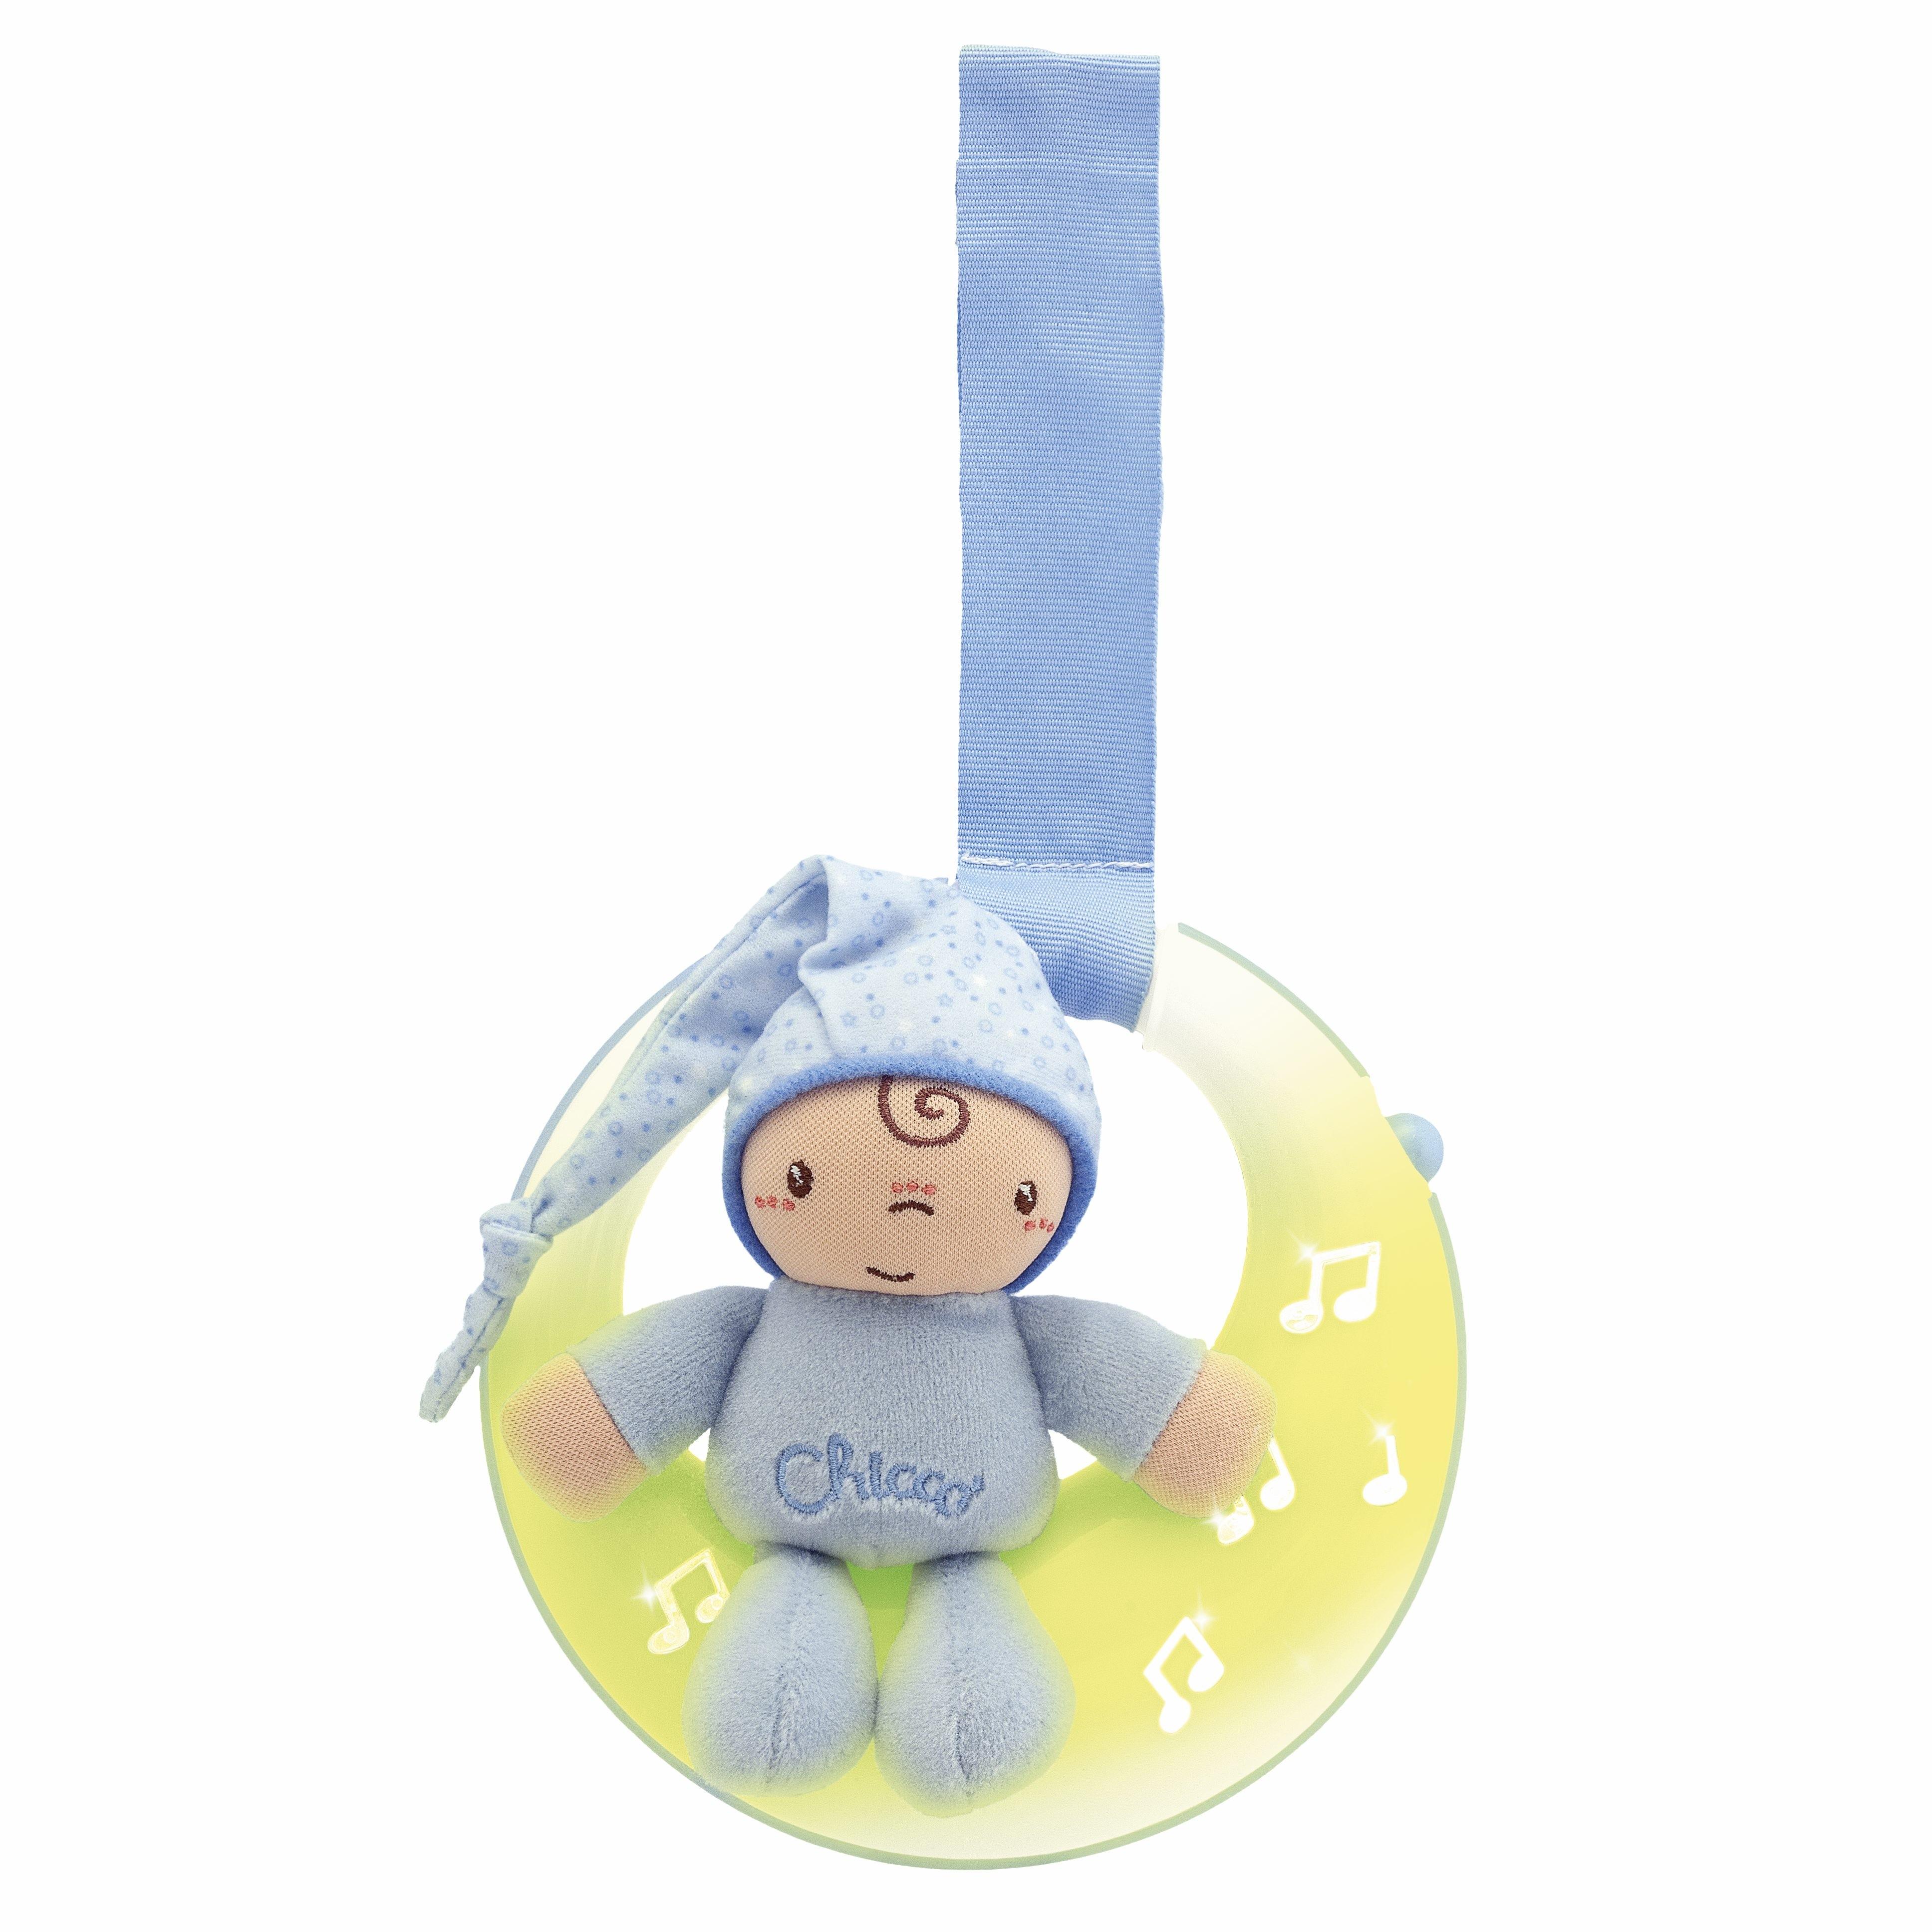 Pannello Goodnight Moon Chicco Blu